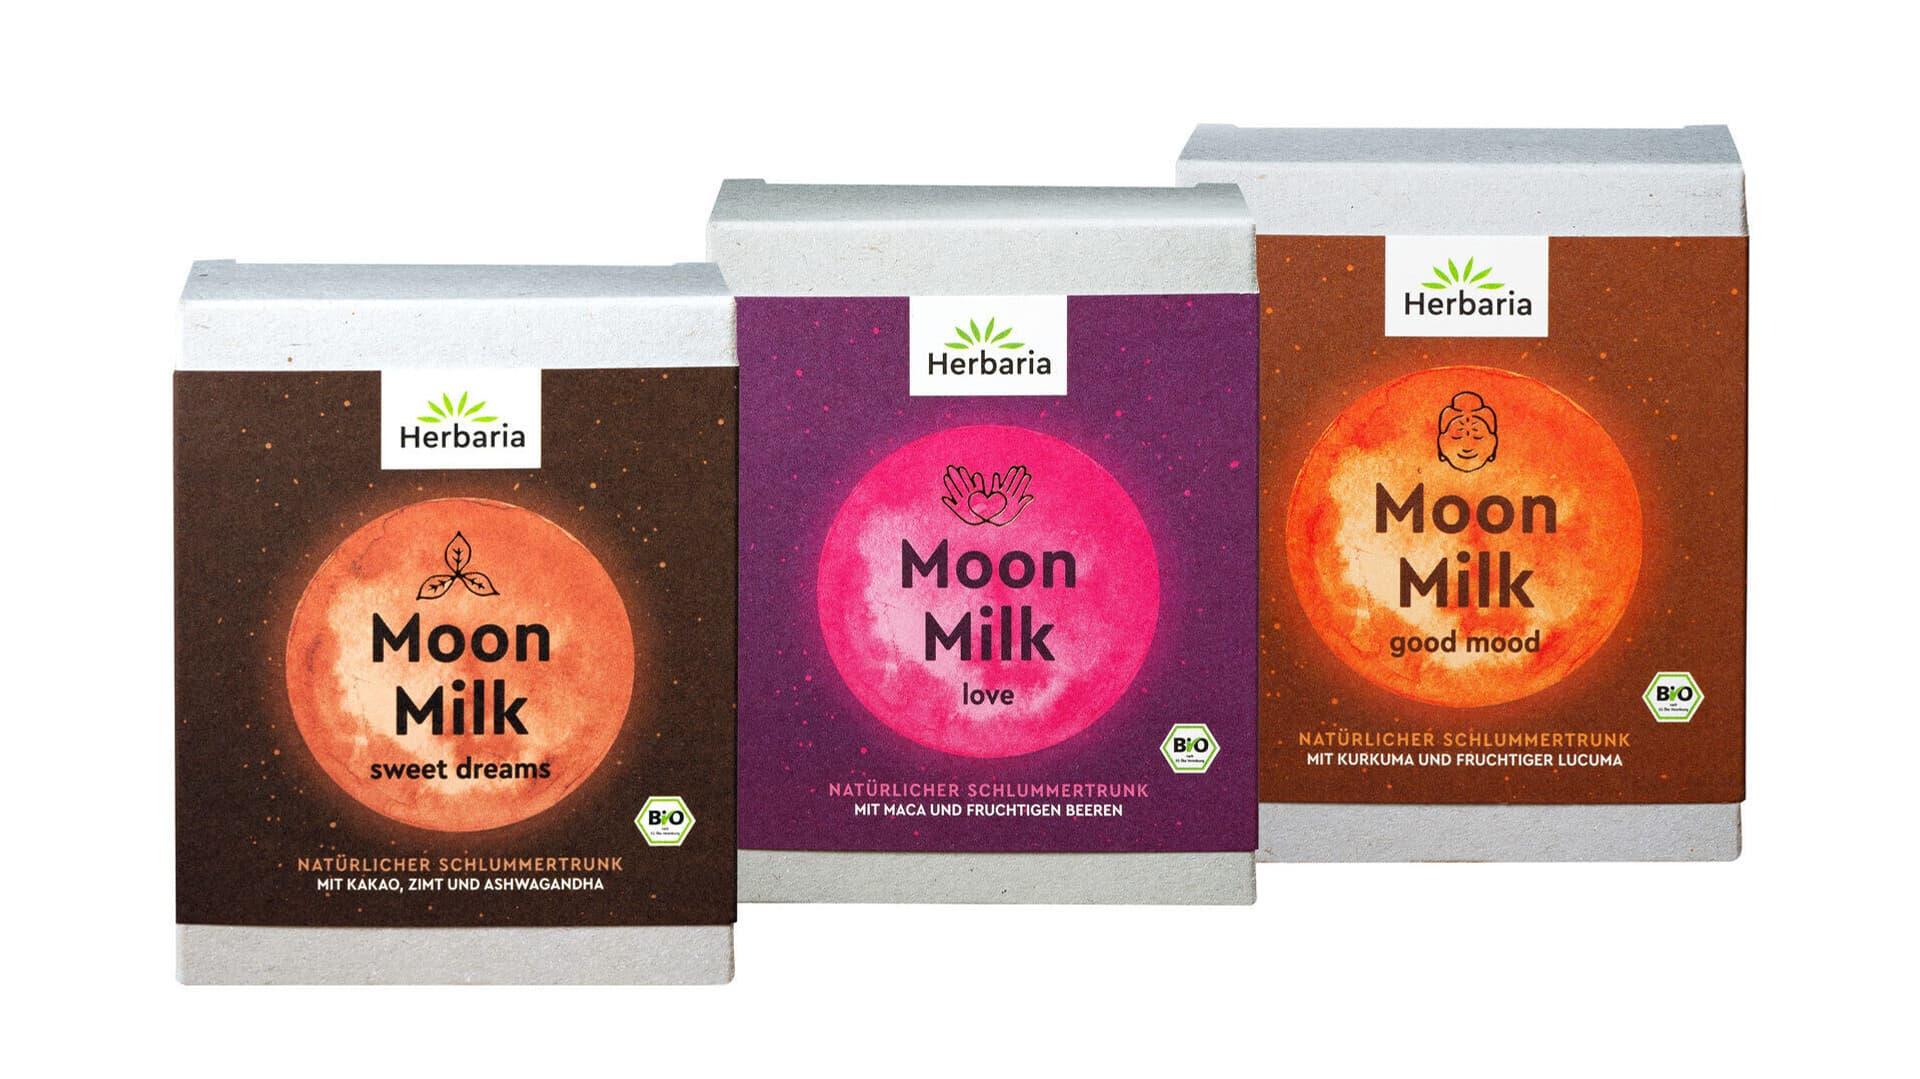 Herbaria Moon Milk